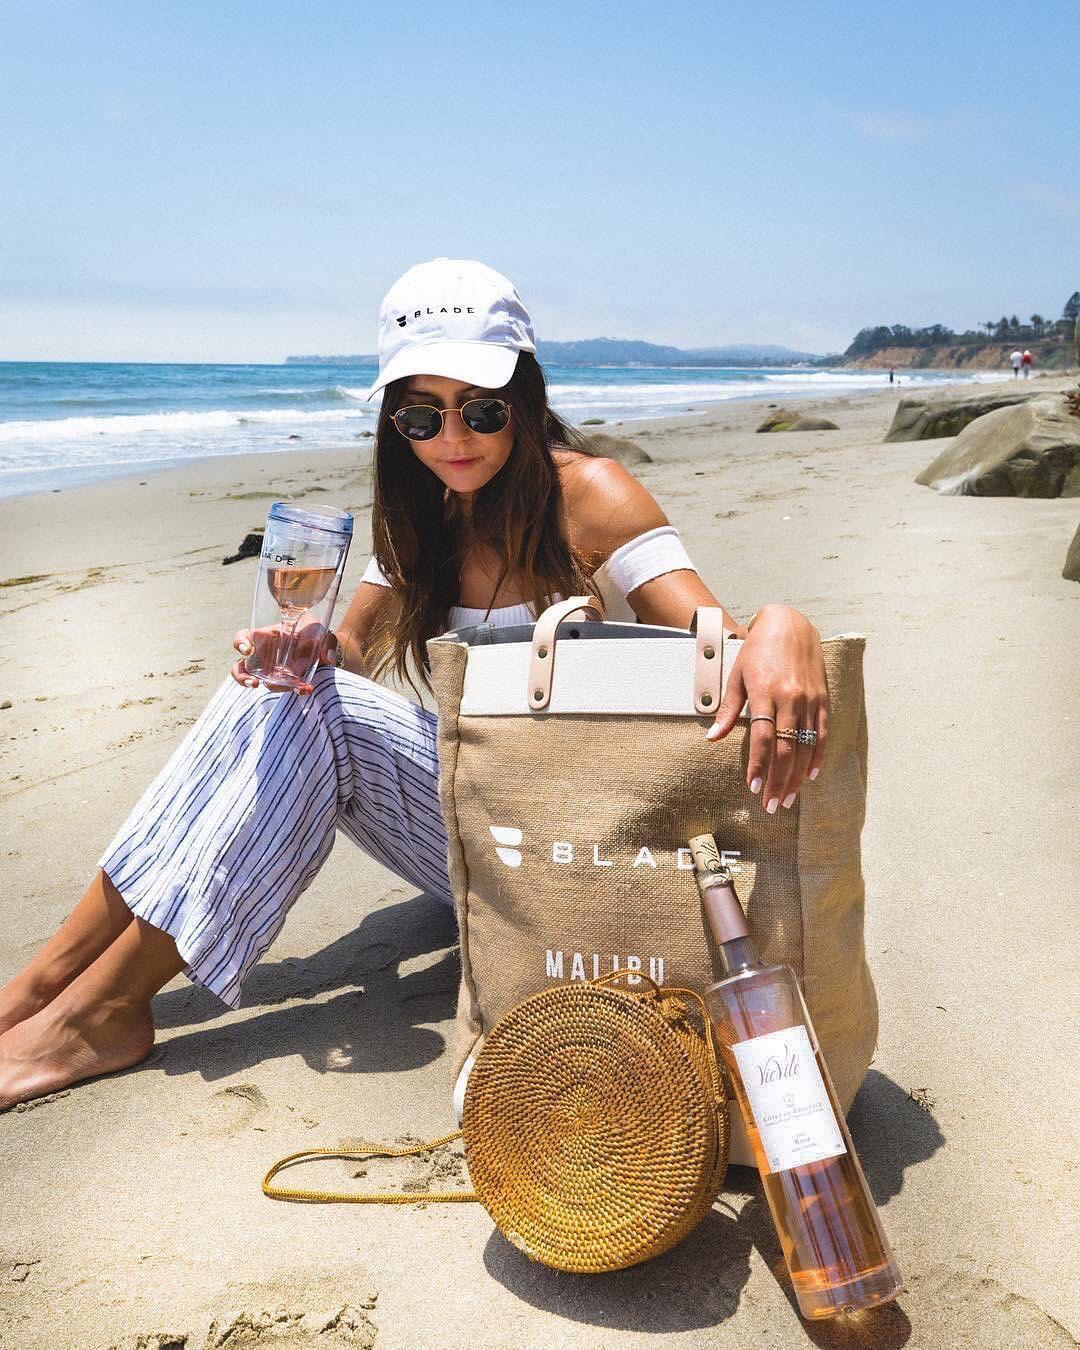 Blade wine bag on beach